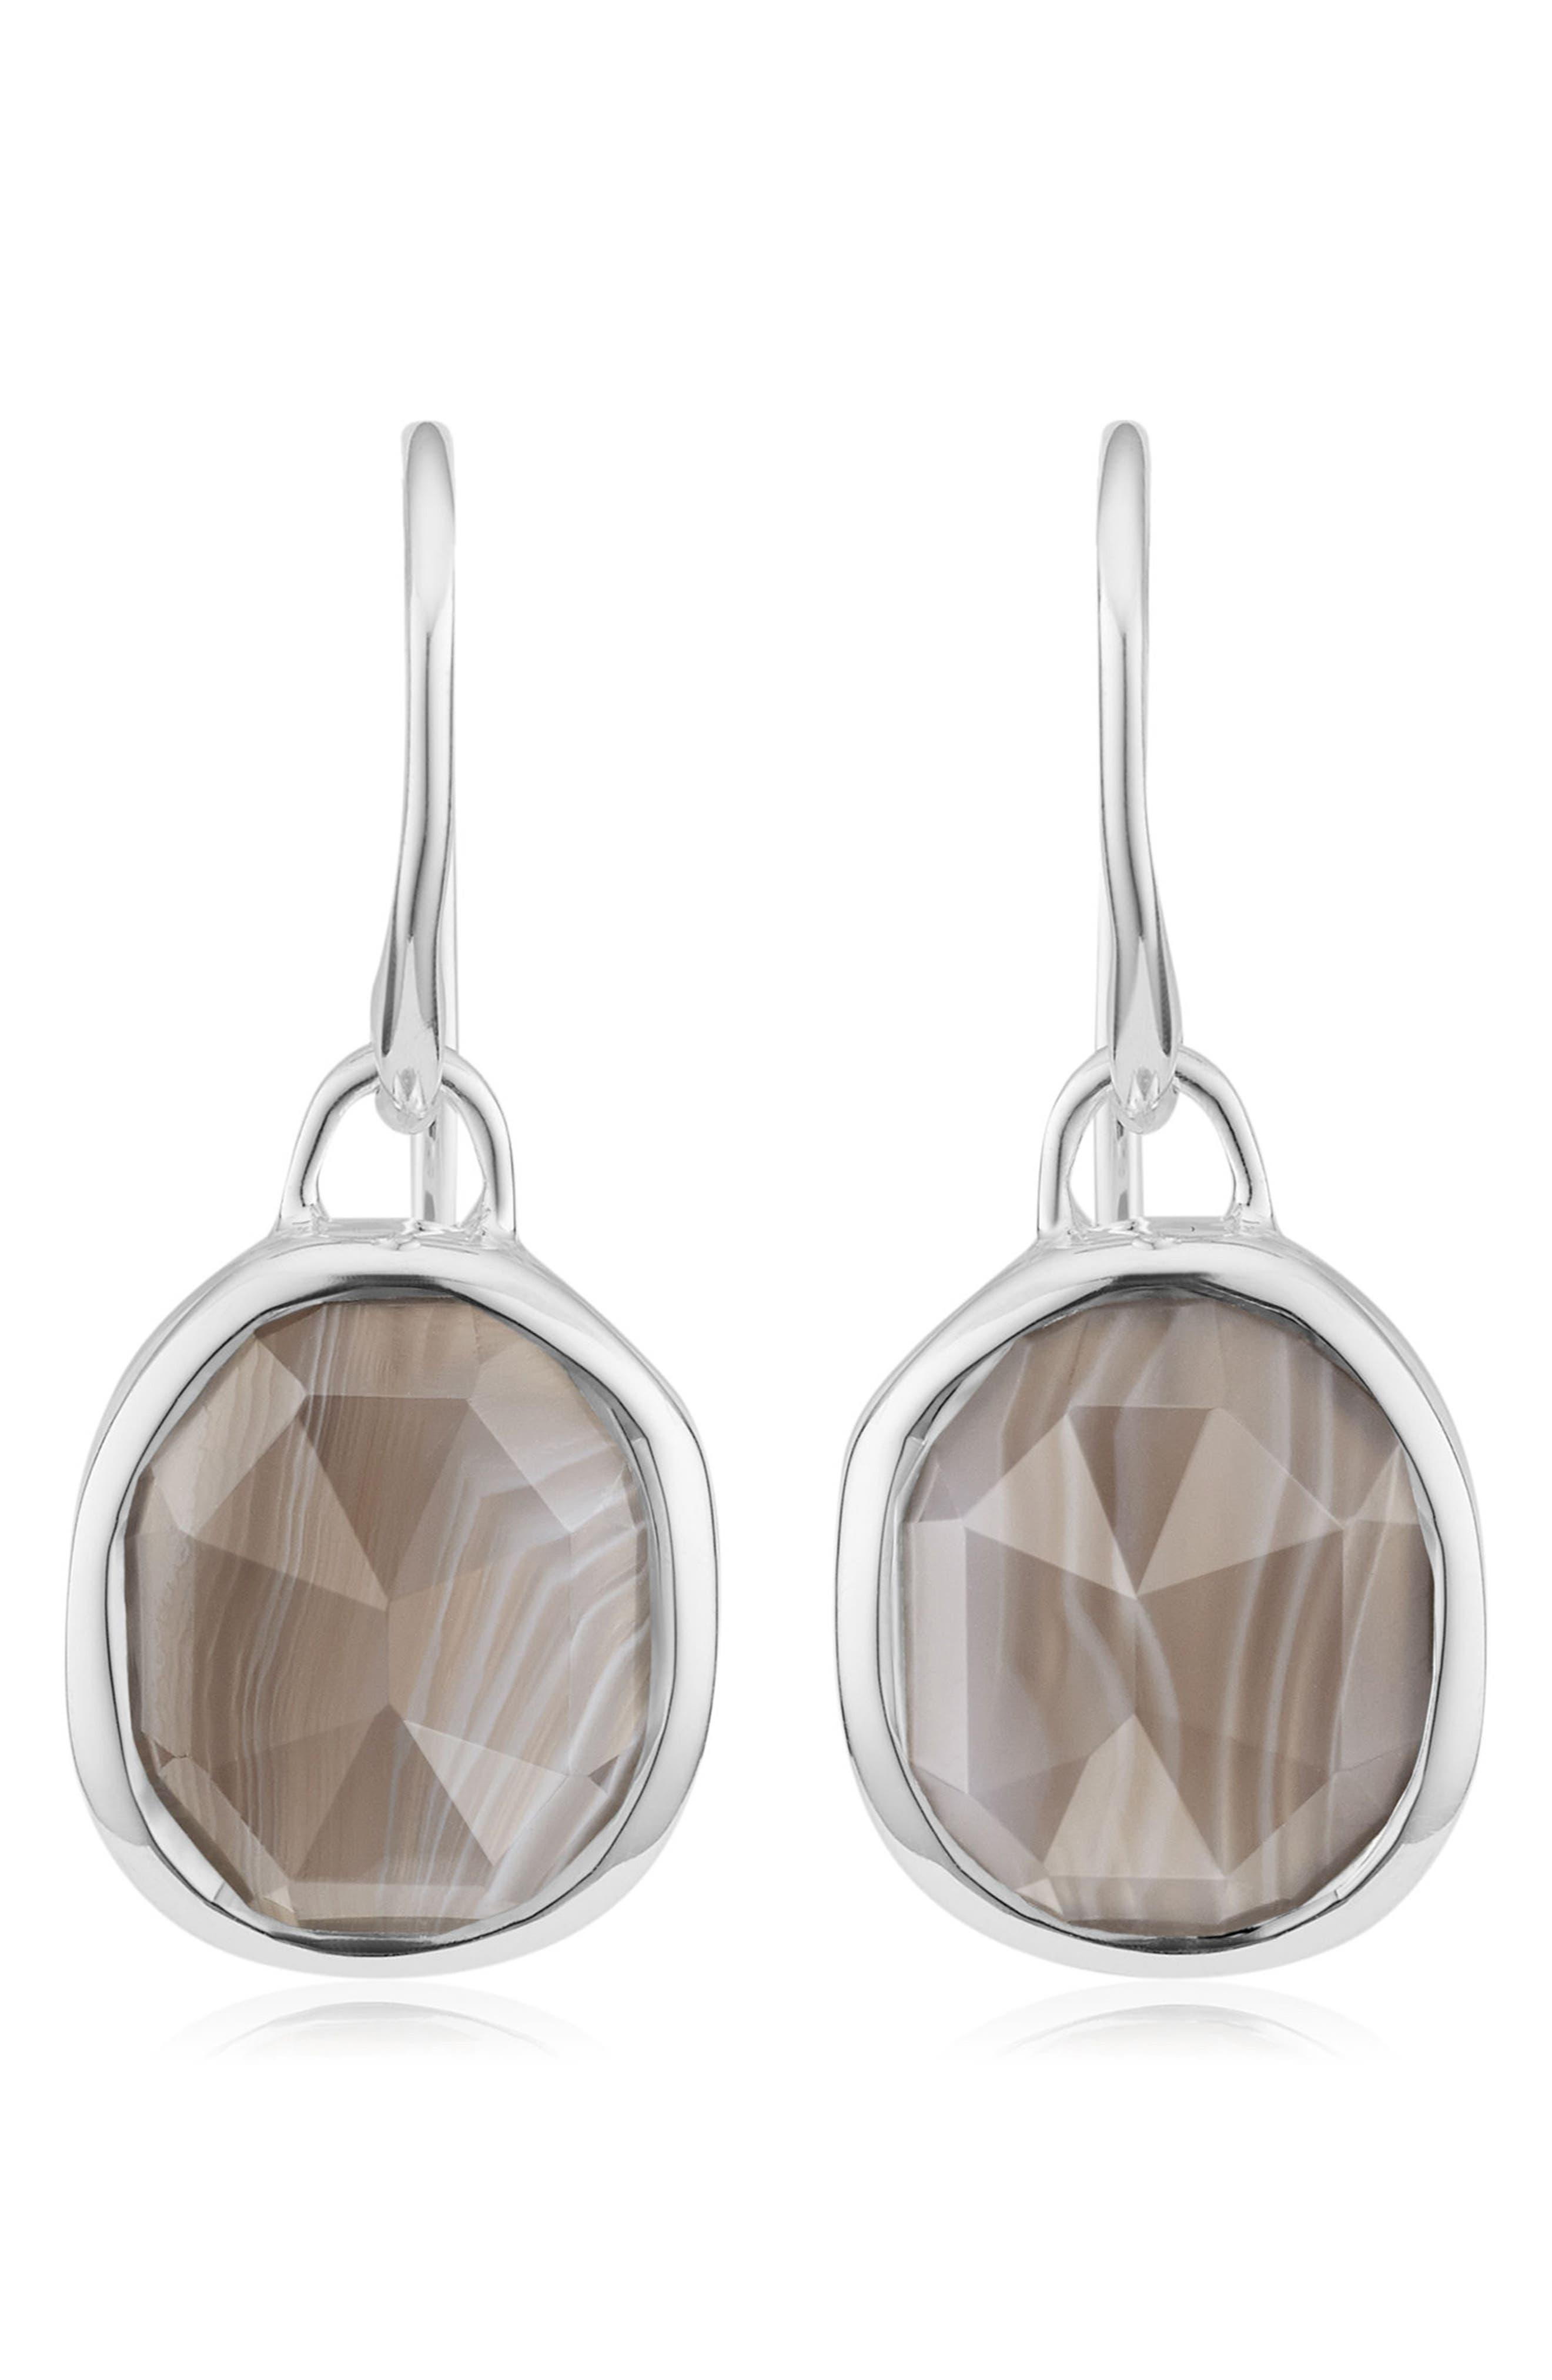 Siren Semiprecious Stone Drop Earrings,                             Main thumbnail 1, color,                             SILVER/ GREY AGATE